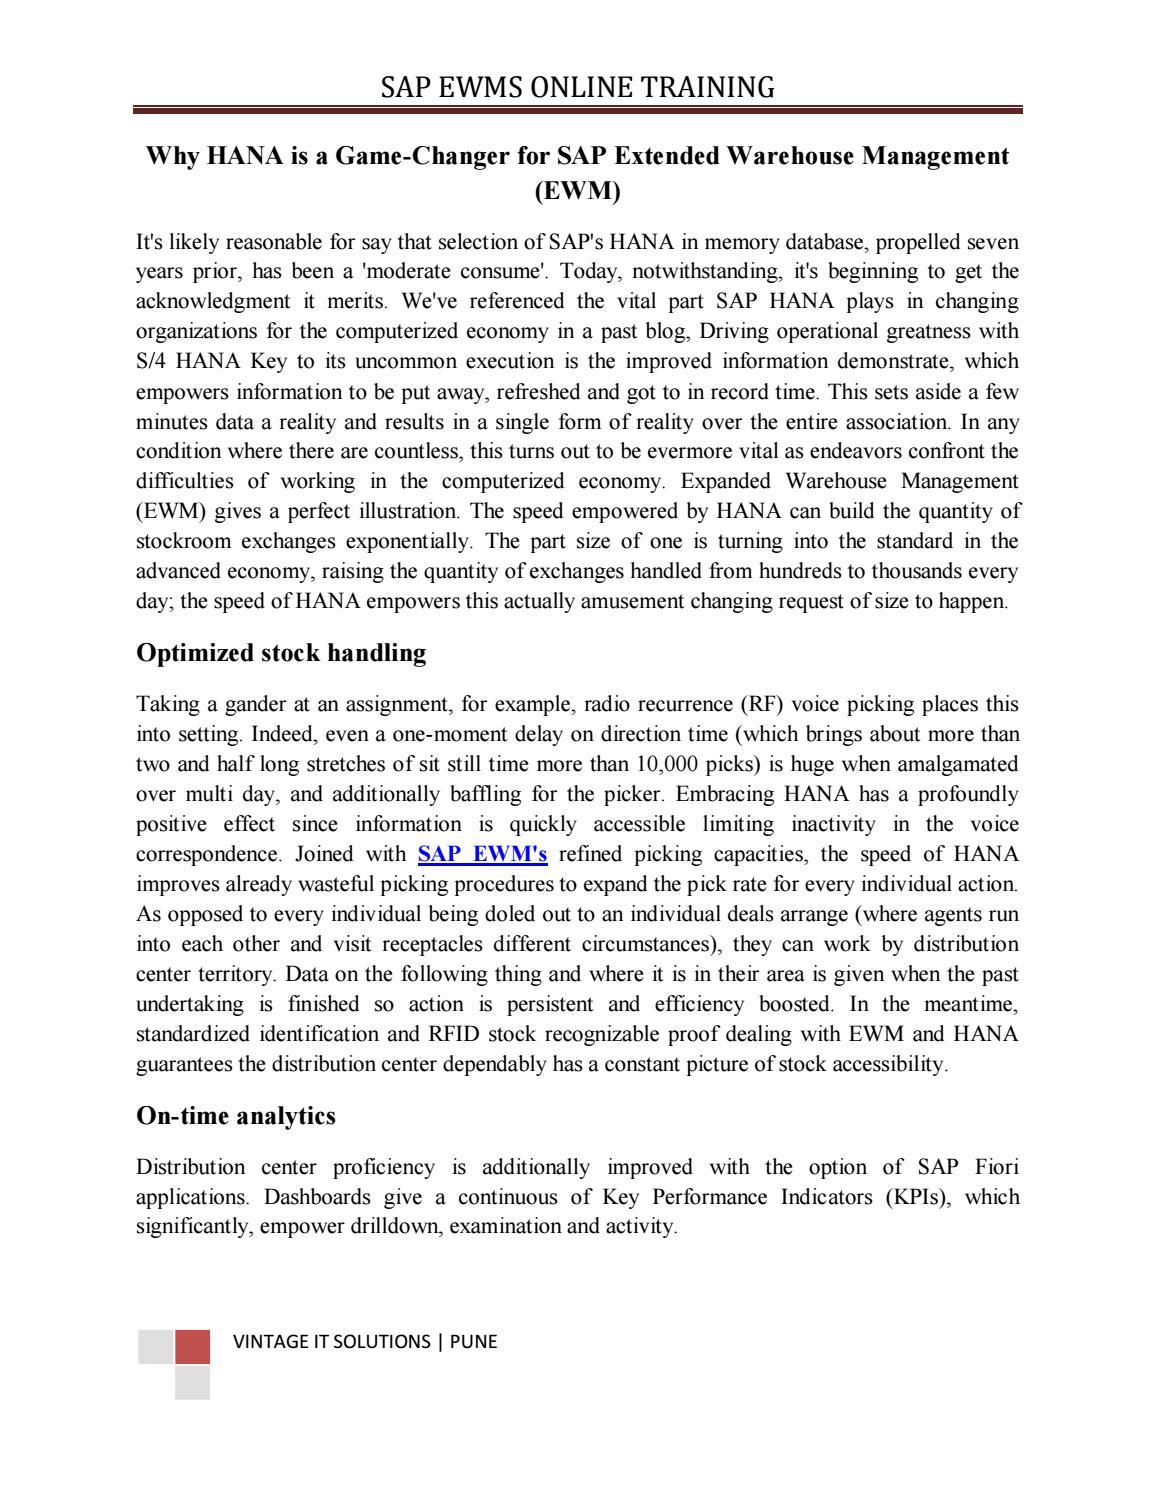 SAP EWMS Online Training Study Material   PDF  SAPVITS by